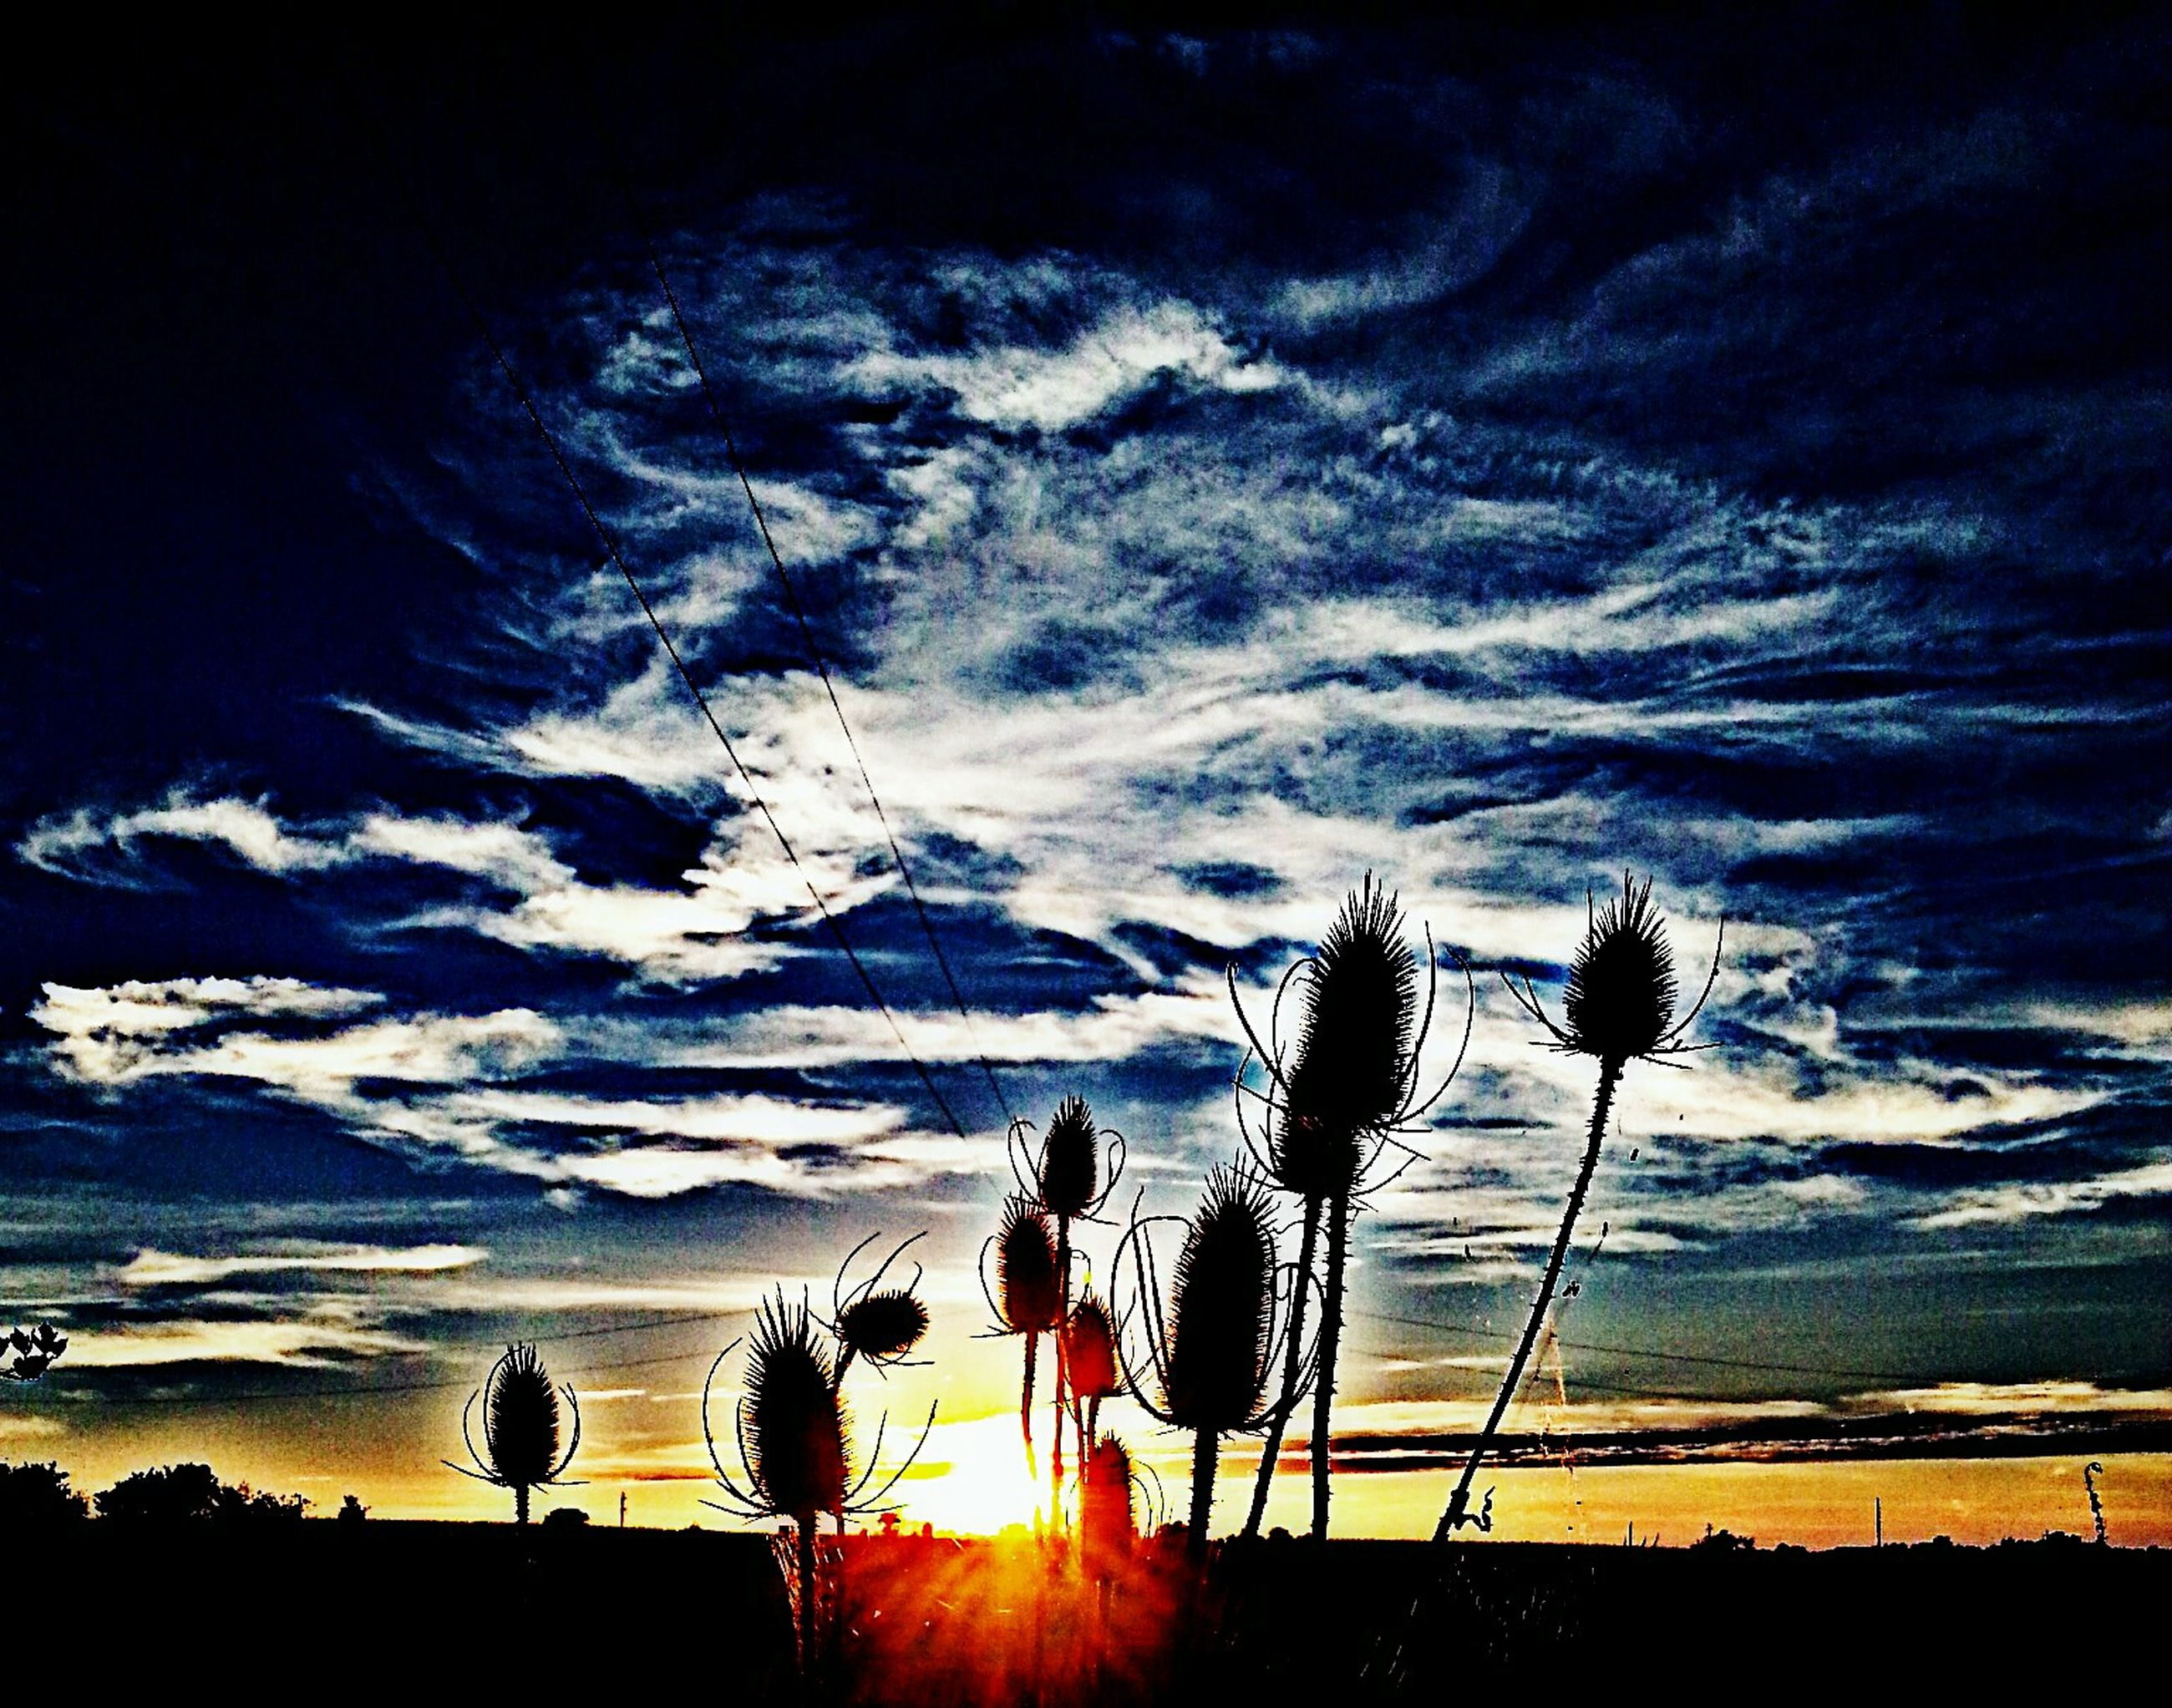 sunset, silhouette, sky, beauty in nature, scenics, tranquil scene, tranquility, cloud - sky, sun, nature, electricity pylon, power line, landscape, idyllic, sunlight, orange color, cloud, tree, low angle view, outdoors